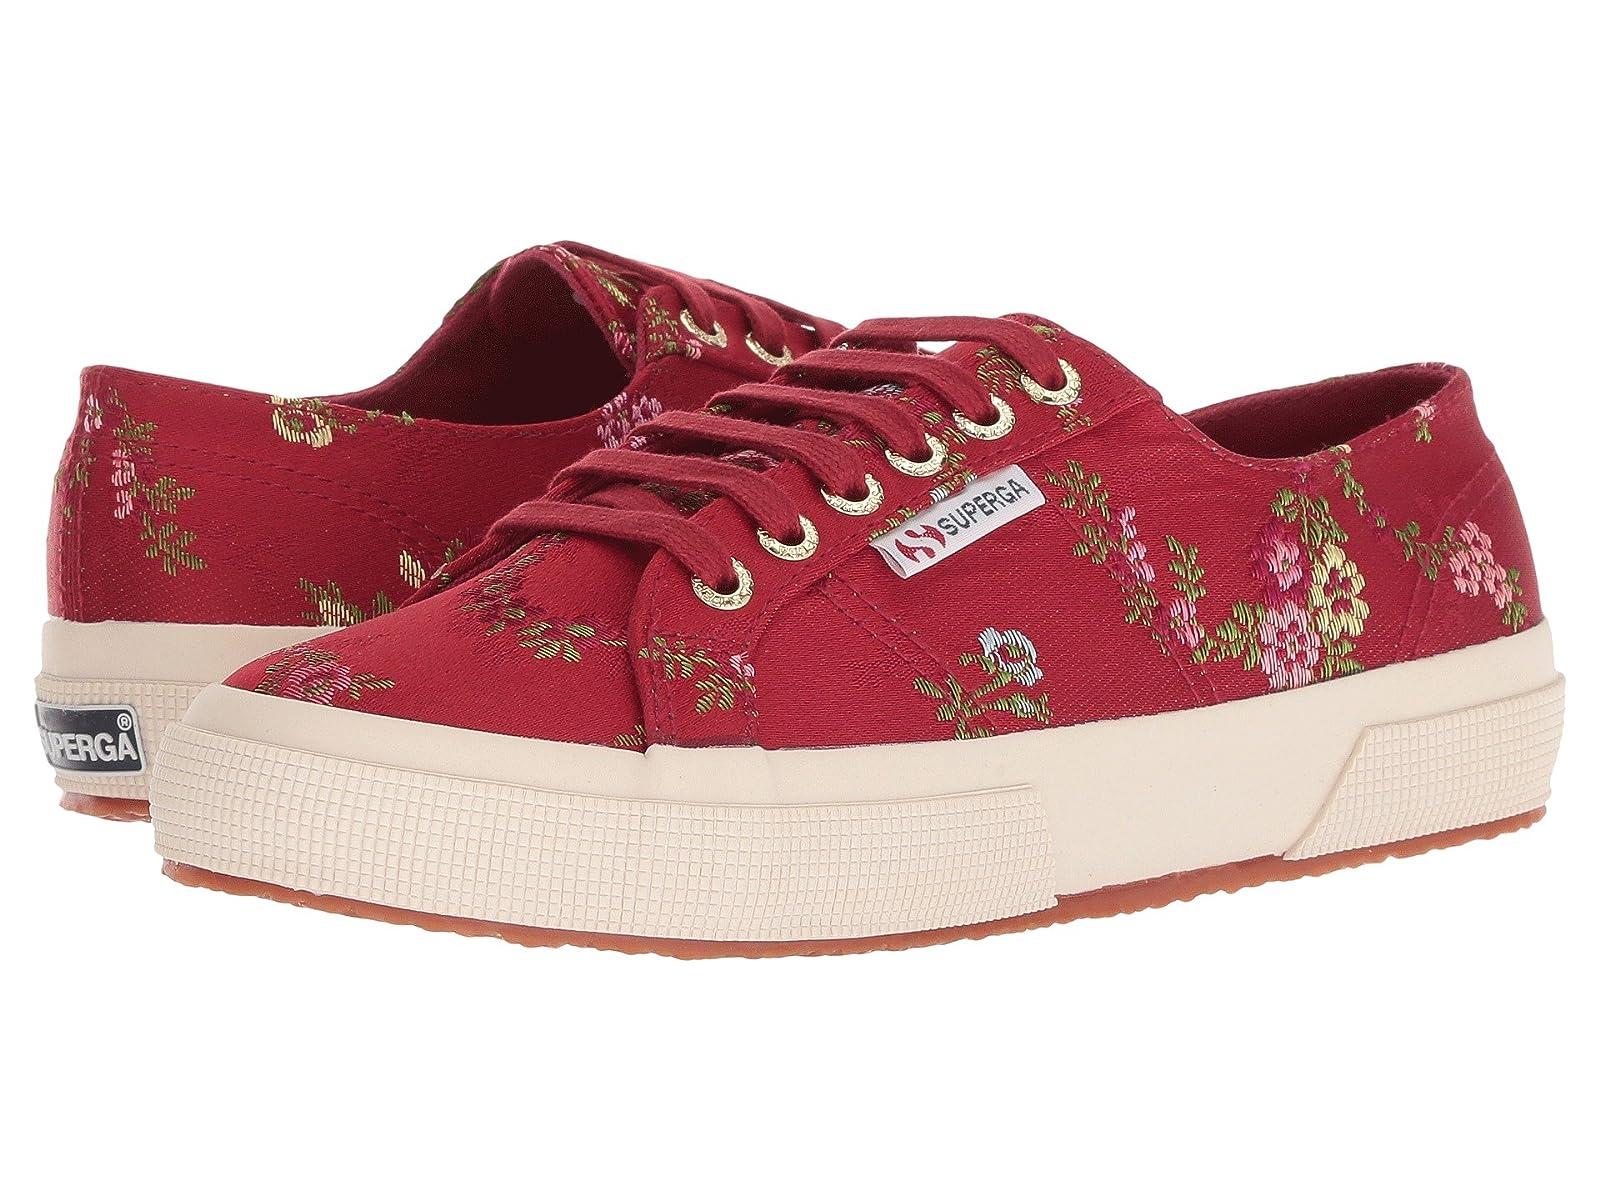 Superga 2750 SatinjacquardflowerwAtmospheric grades have affordable shoes